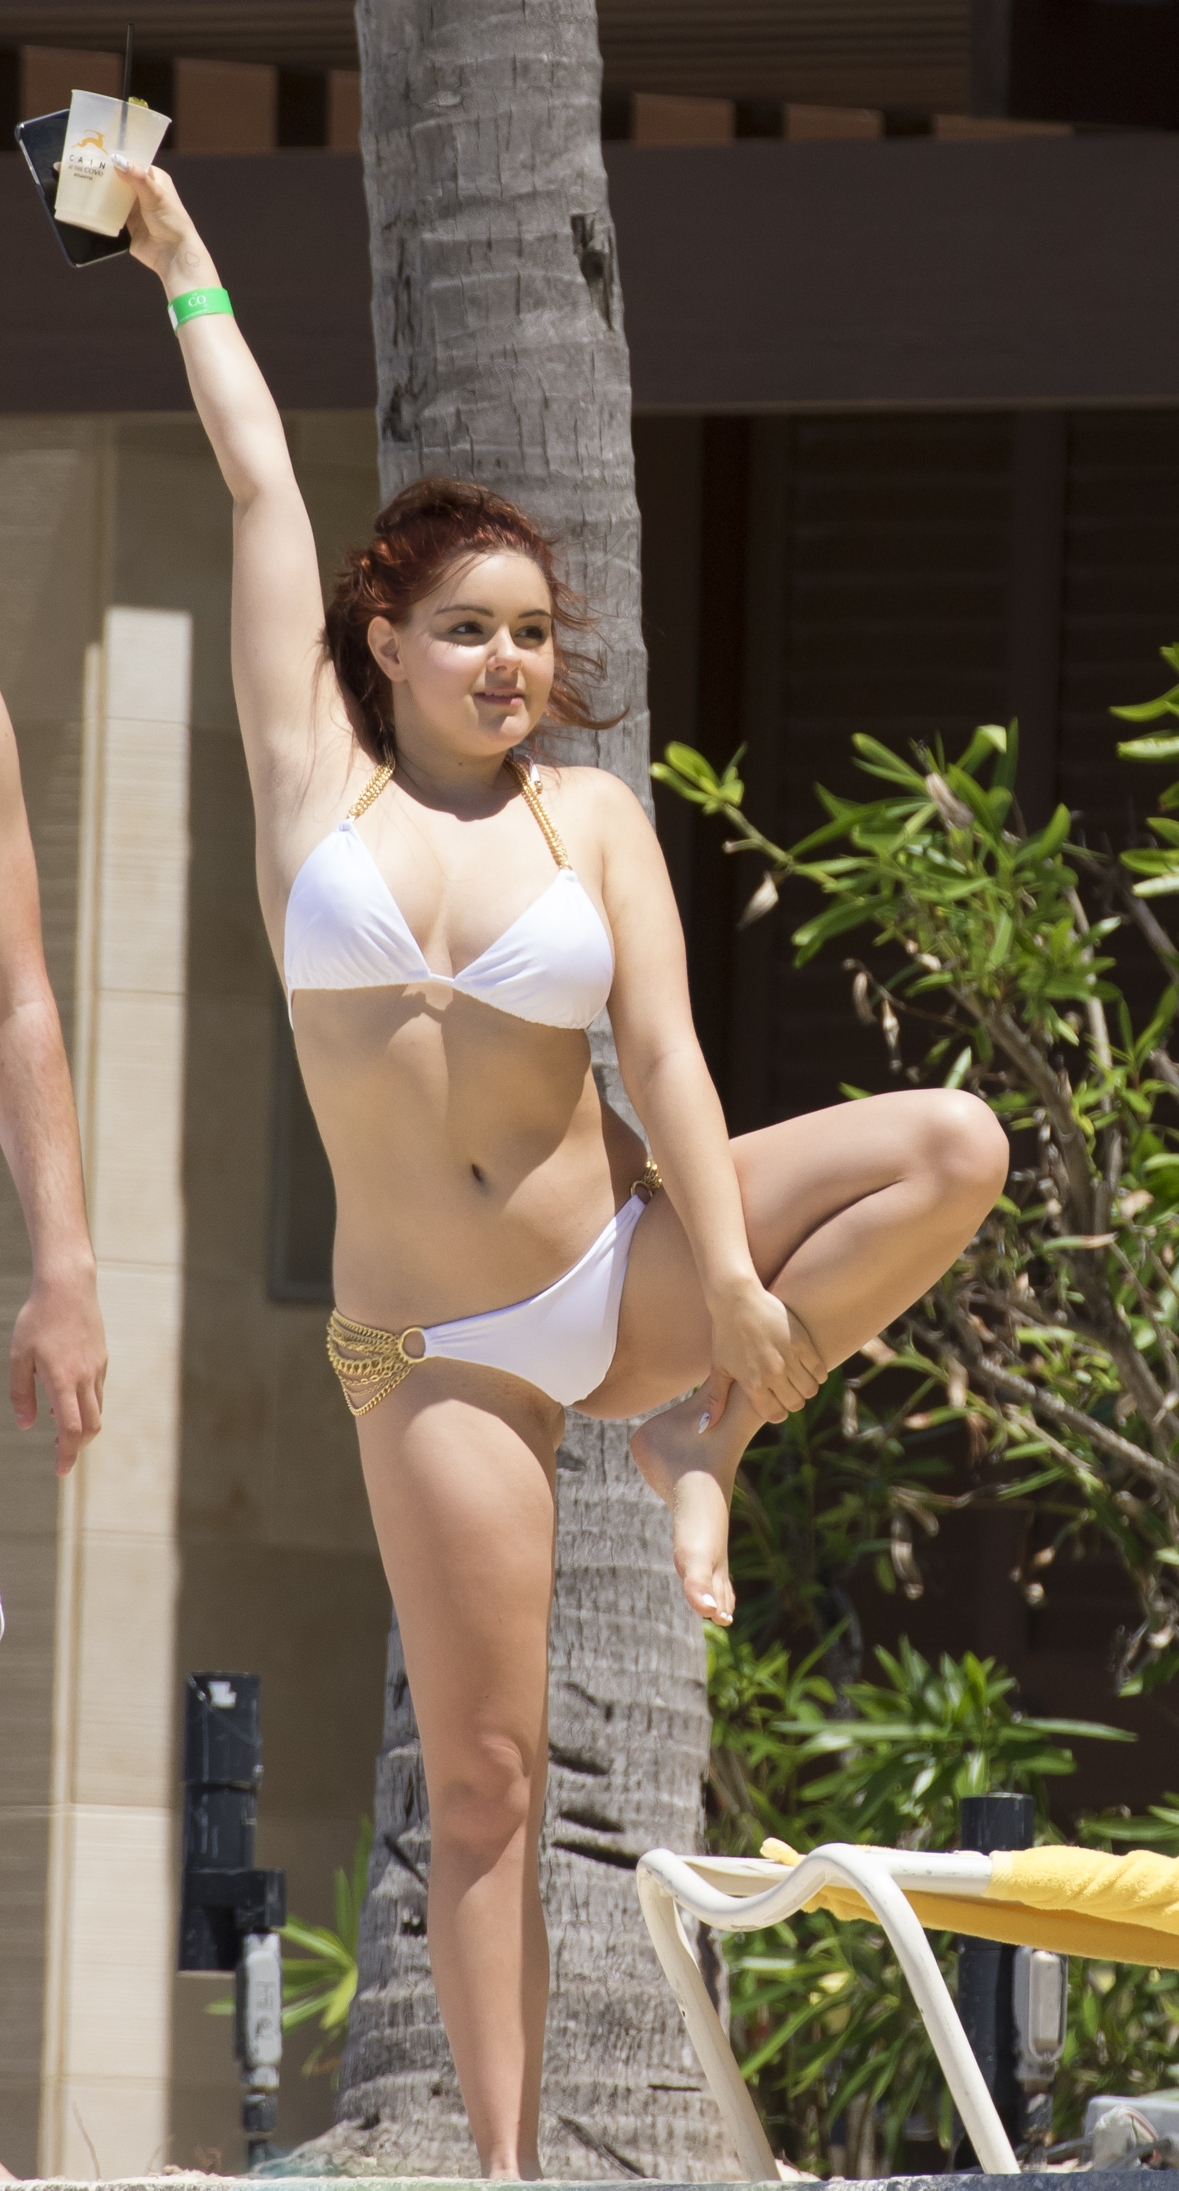 Ariel Winter exposing boobs